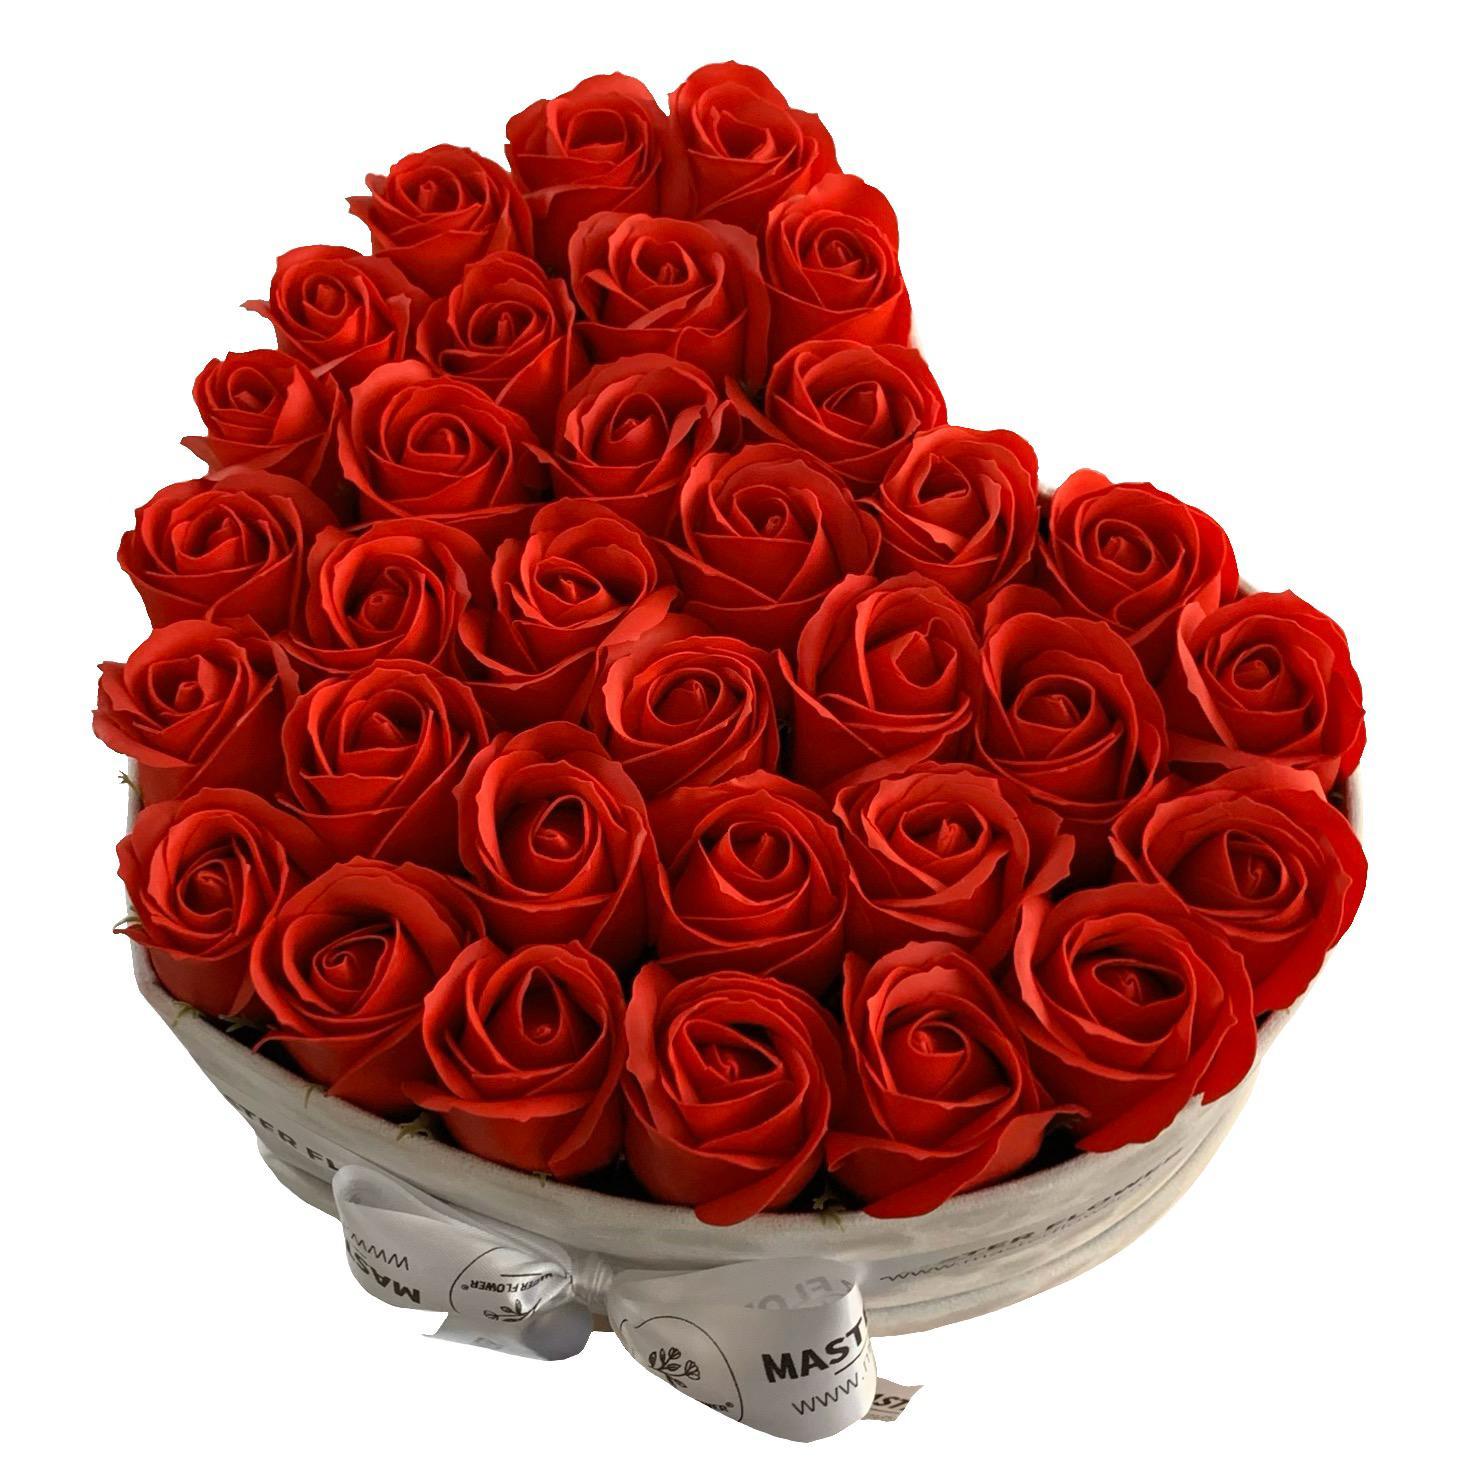 Aranjament in forma de inima cu trandafiri rosii de sapun